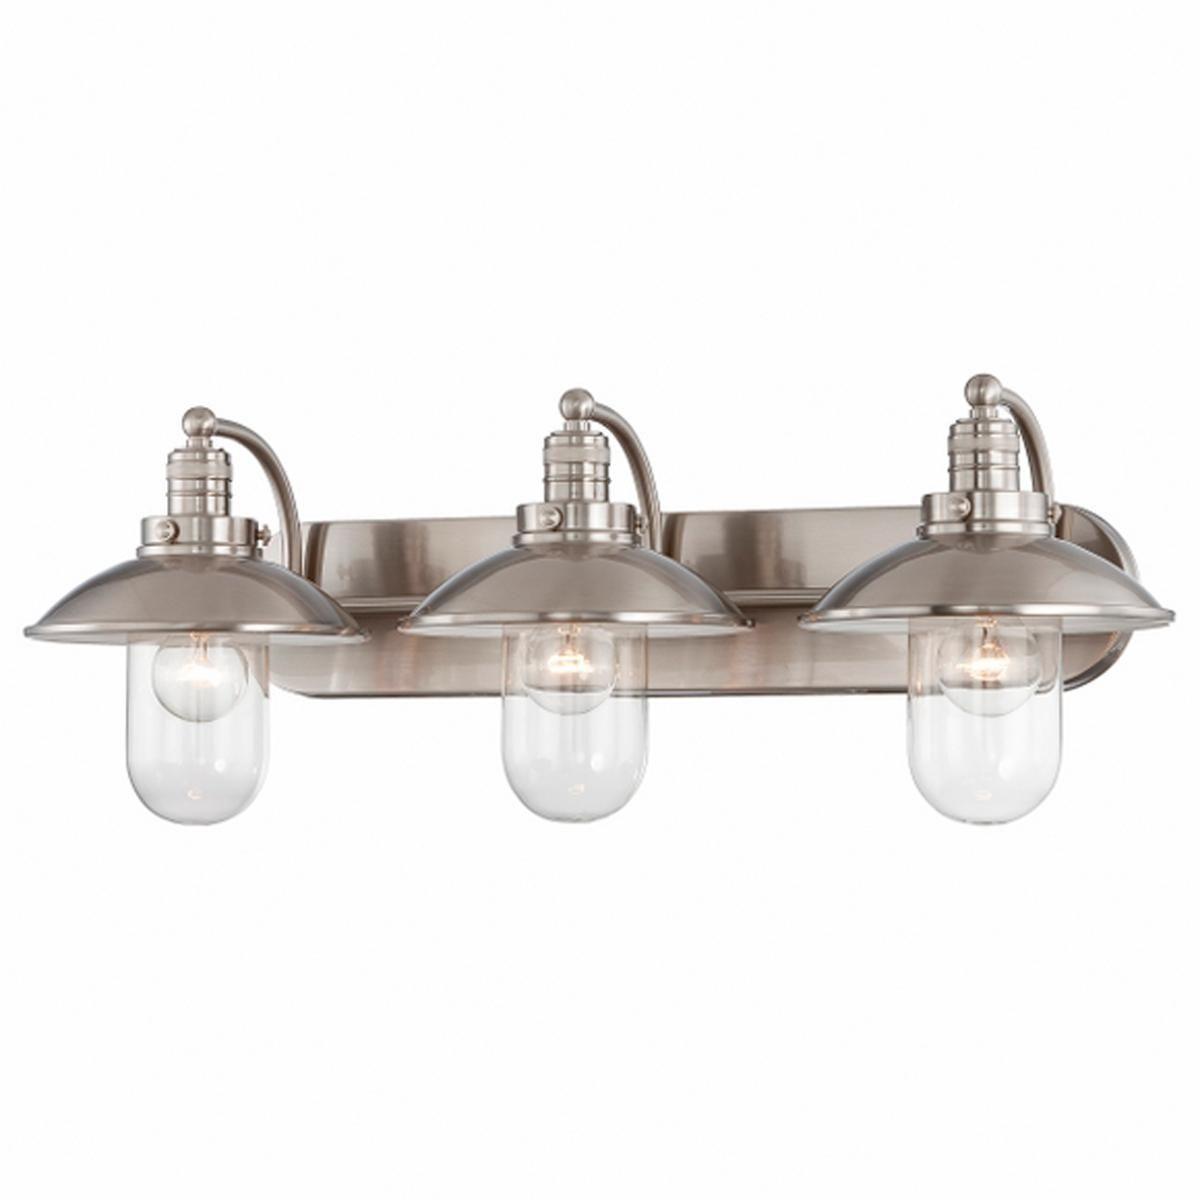 Schooner 3 Light Bath Nautical Or Look Love It With Edison Filament Bulbs Brushed Nickel Vanity